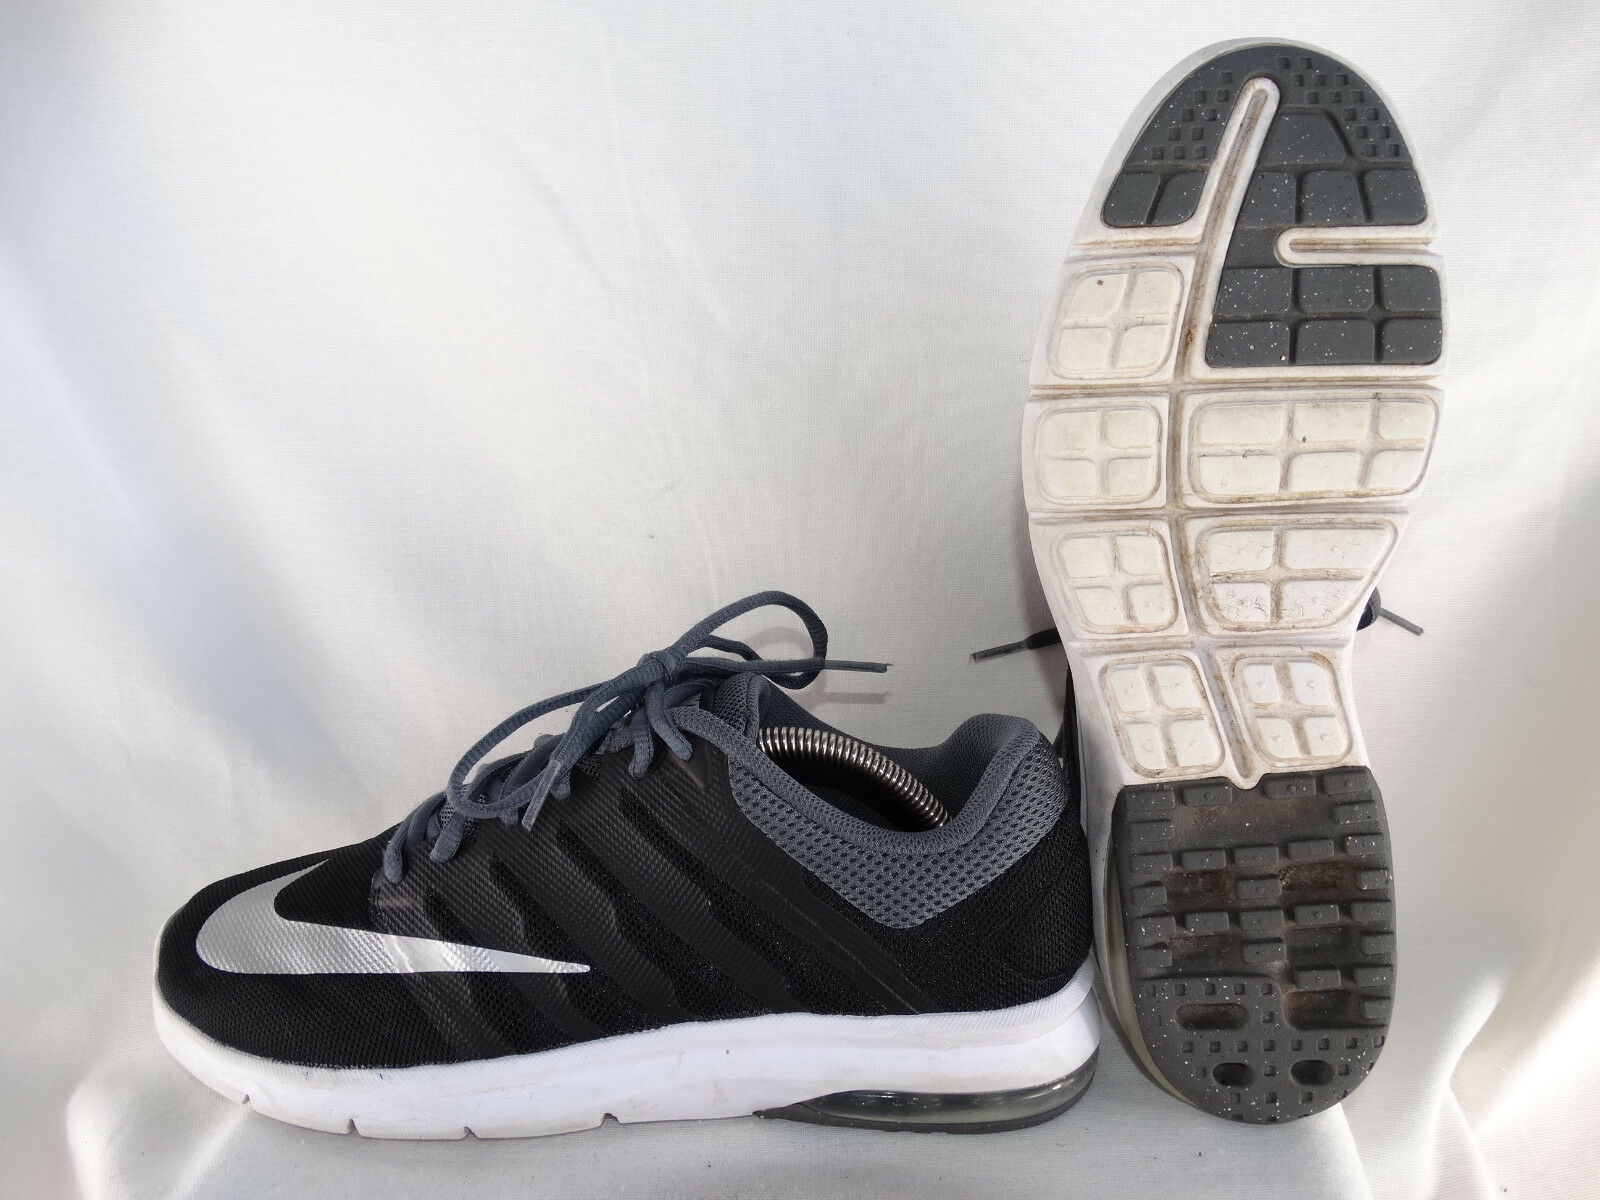 Nike Air Max Era Laufschuhe 811099-001 schwarz-grau EU 43 US 9,5